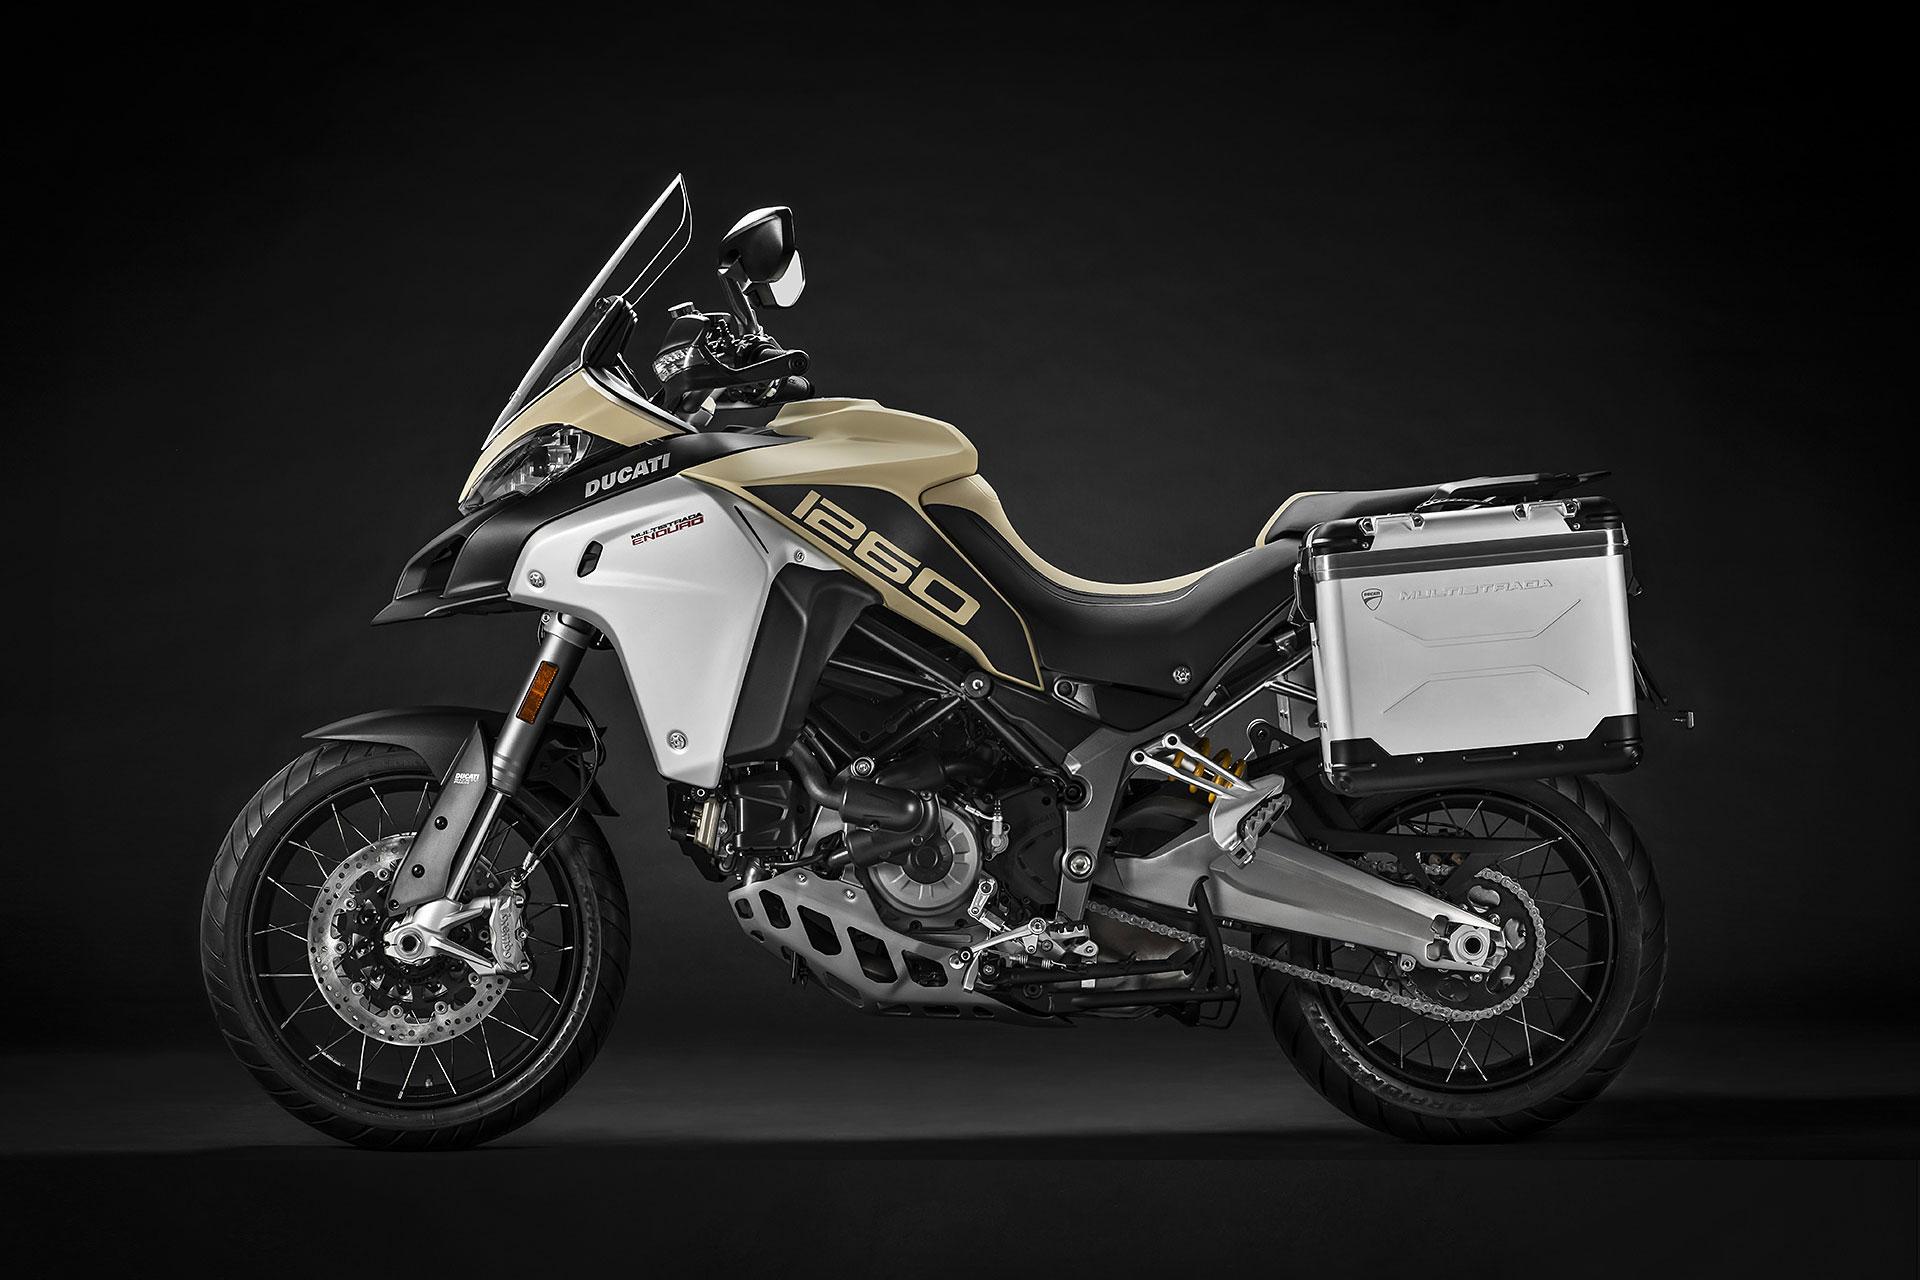 2019 ducati multistrada 1260 enduro motorcycle uncrate. Black Bedroom Furniture Sets. Home Design Ideas